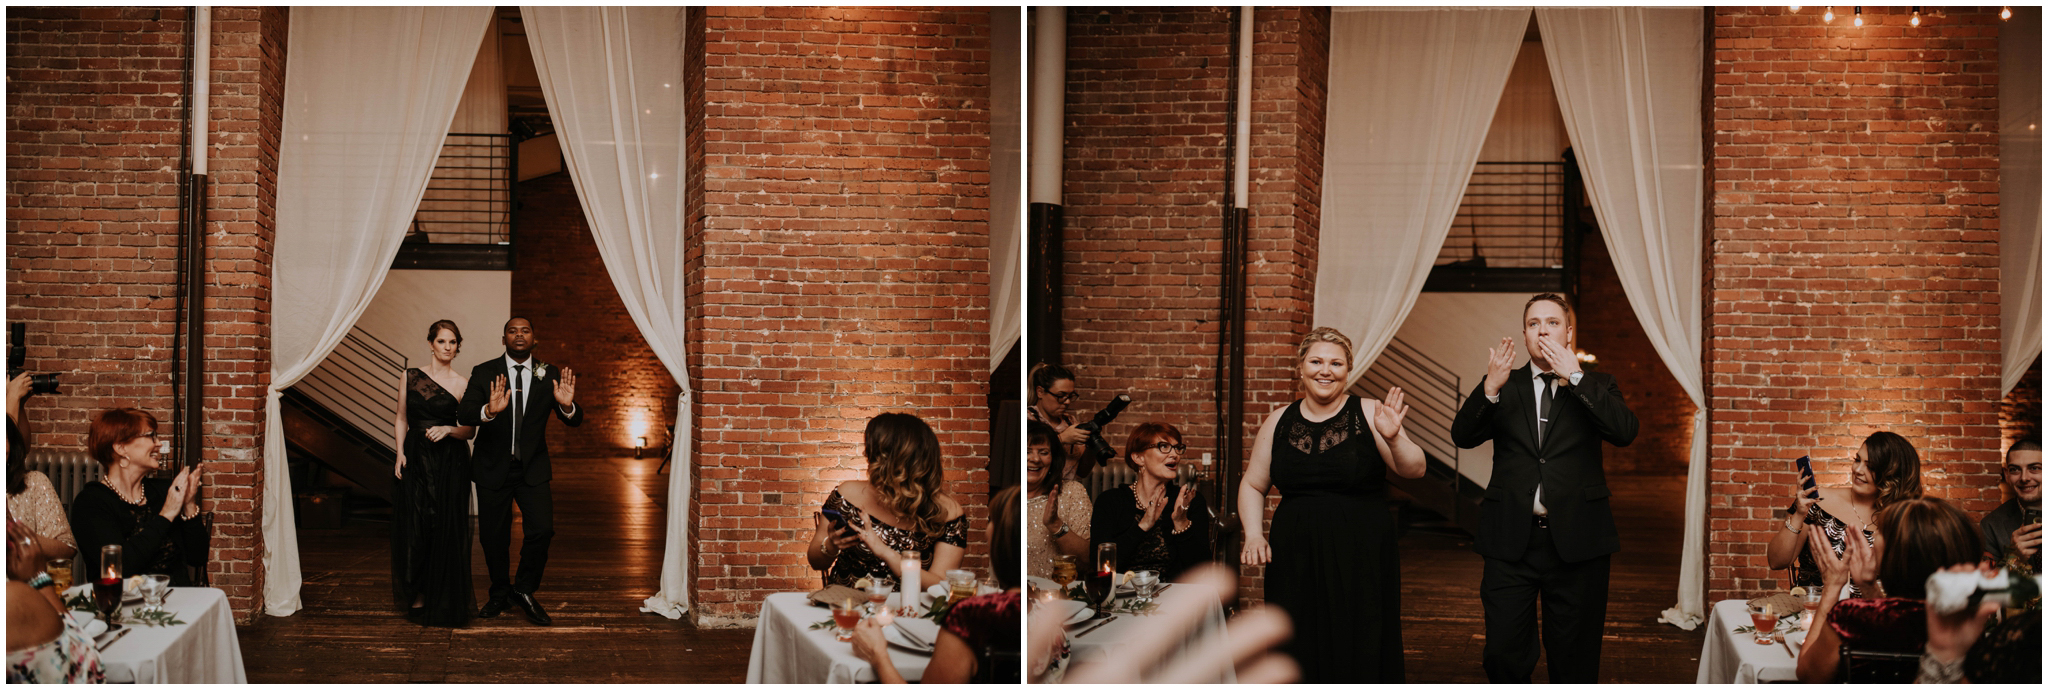 danny+mackenzie+downtown-seattle-axis-wedding-seattle-photographer-099.jpg